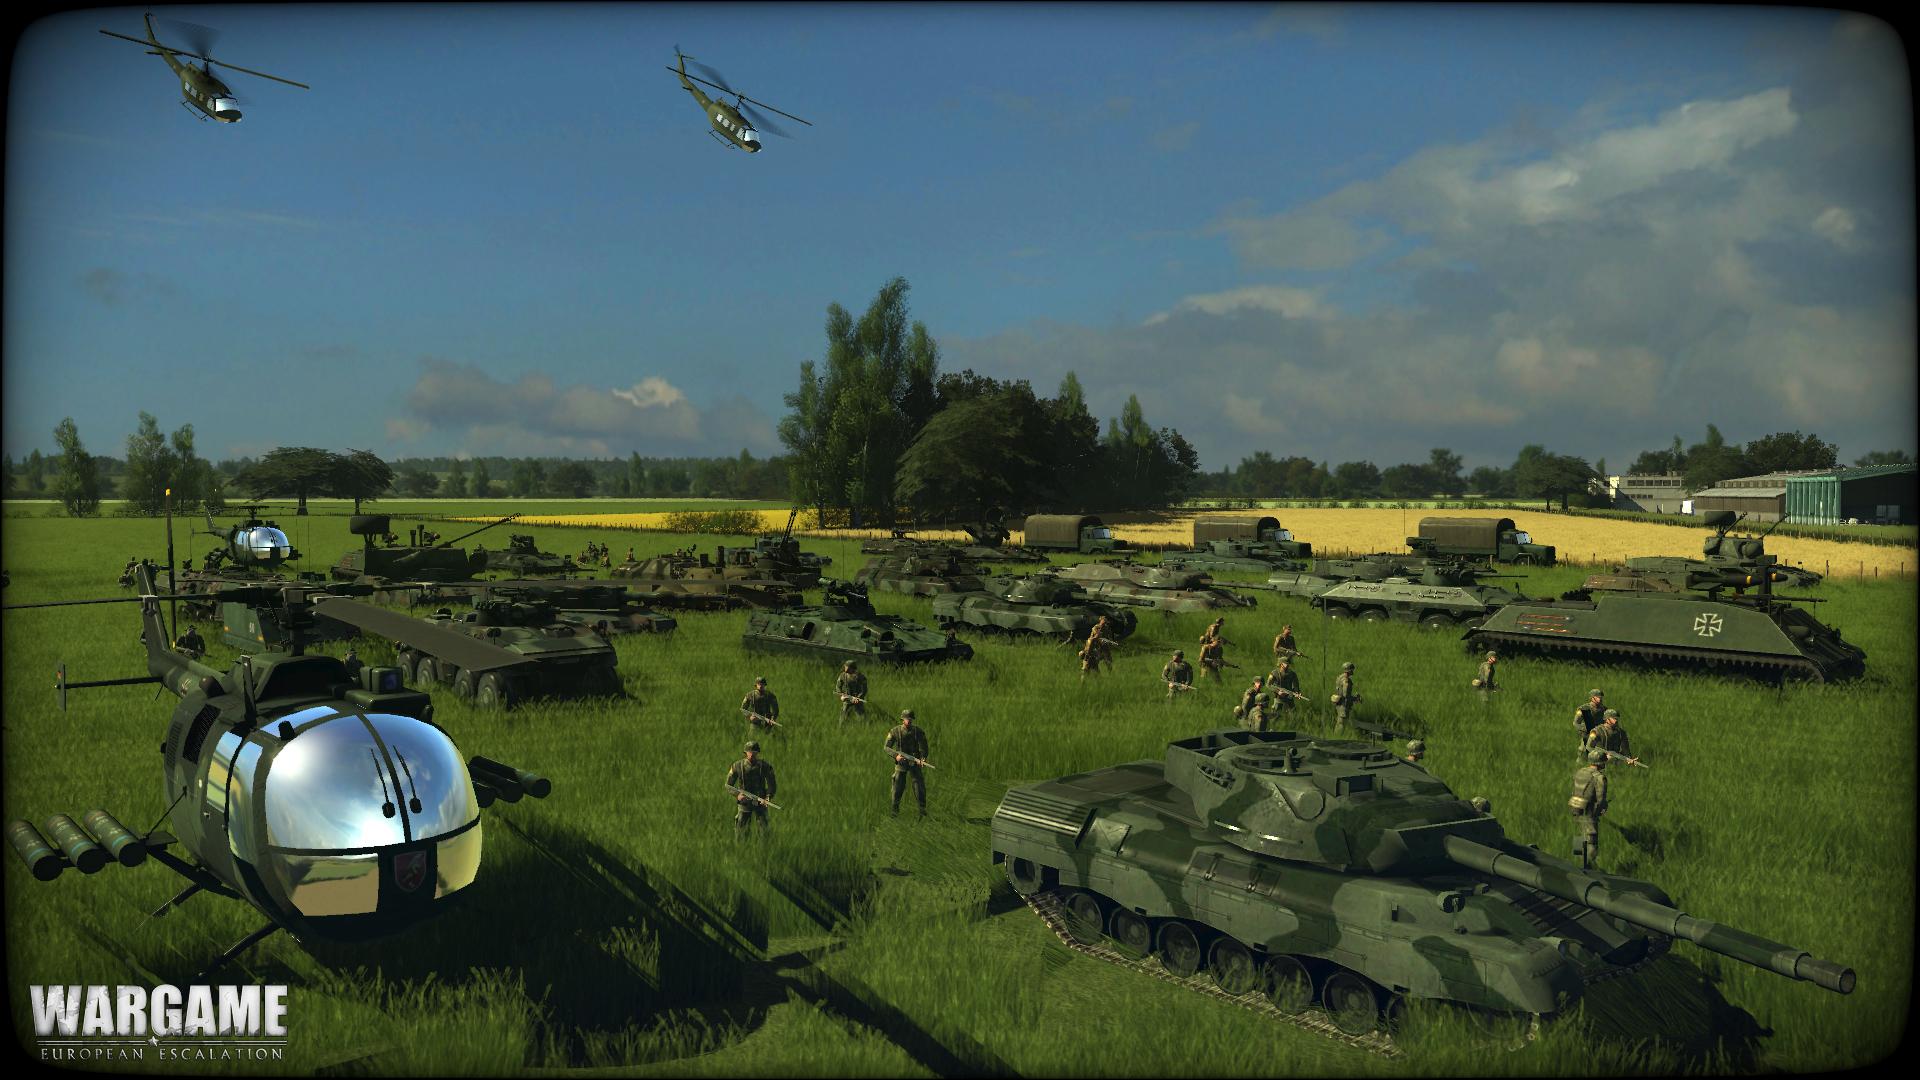 Obrázky z Wargame: European Escalation 59302